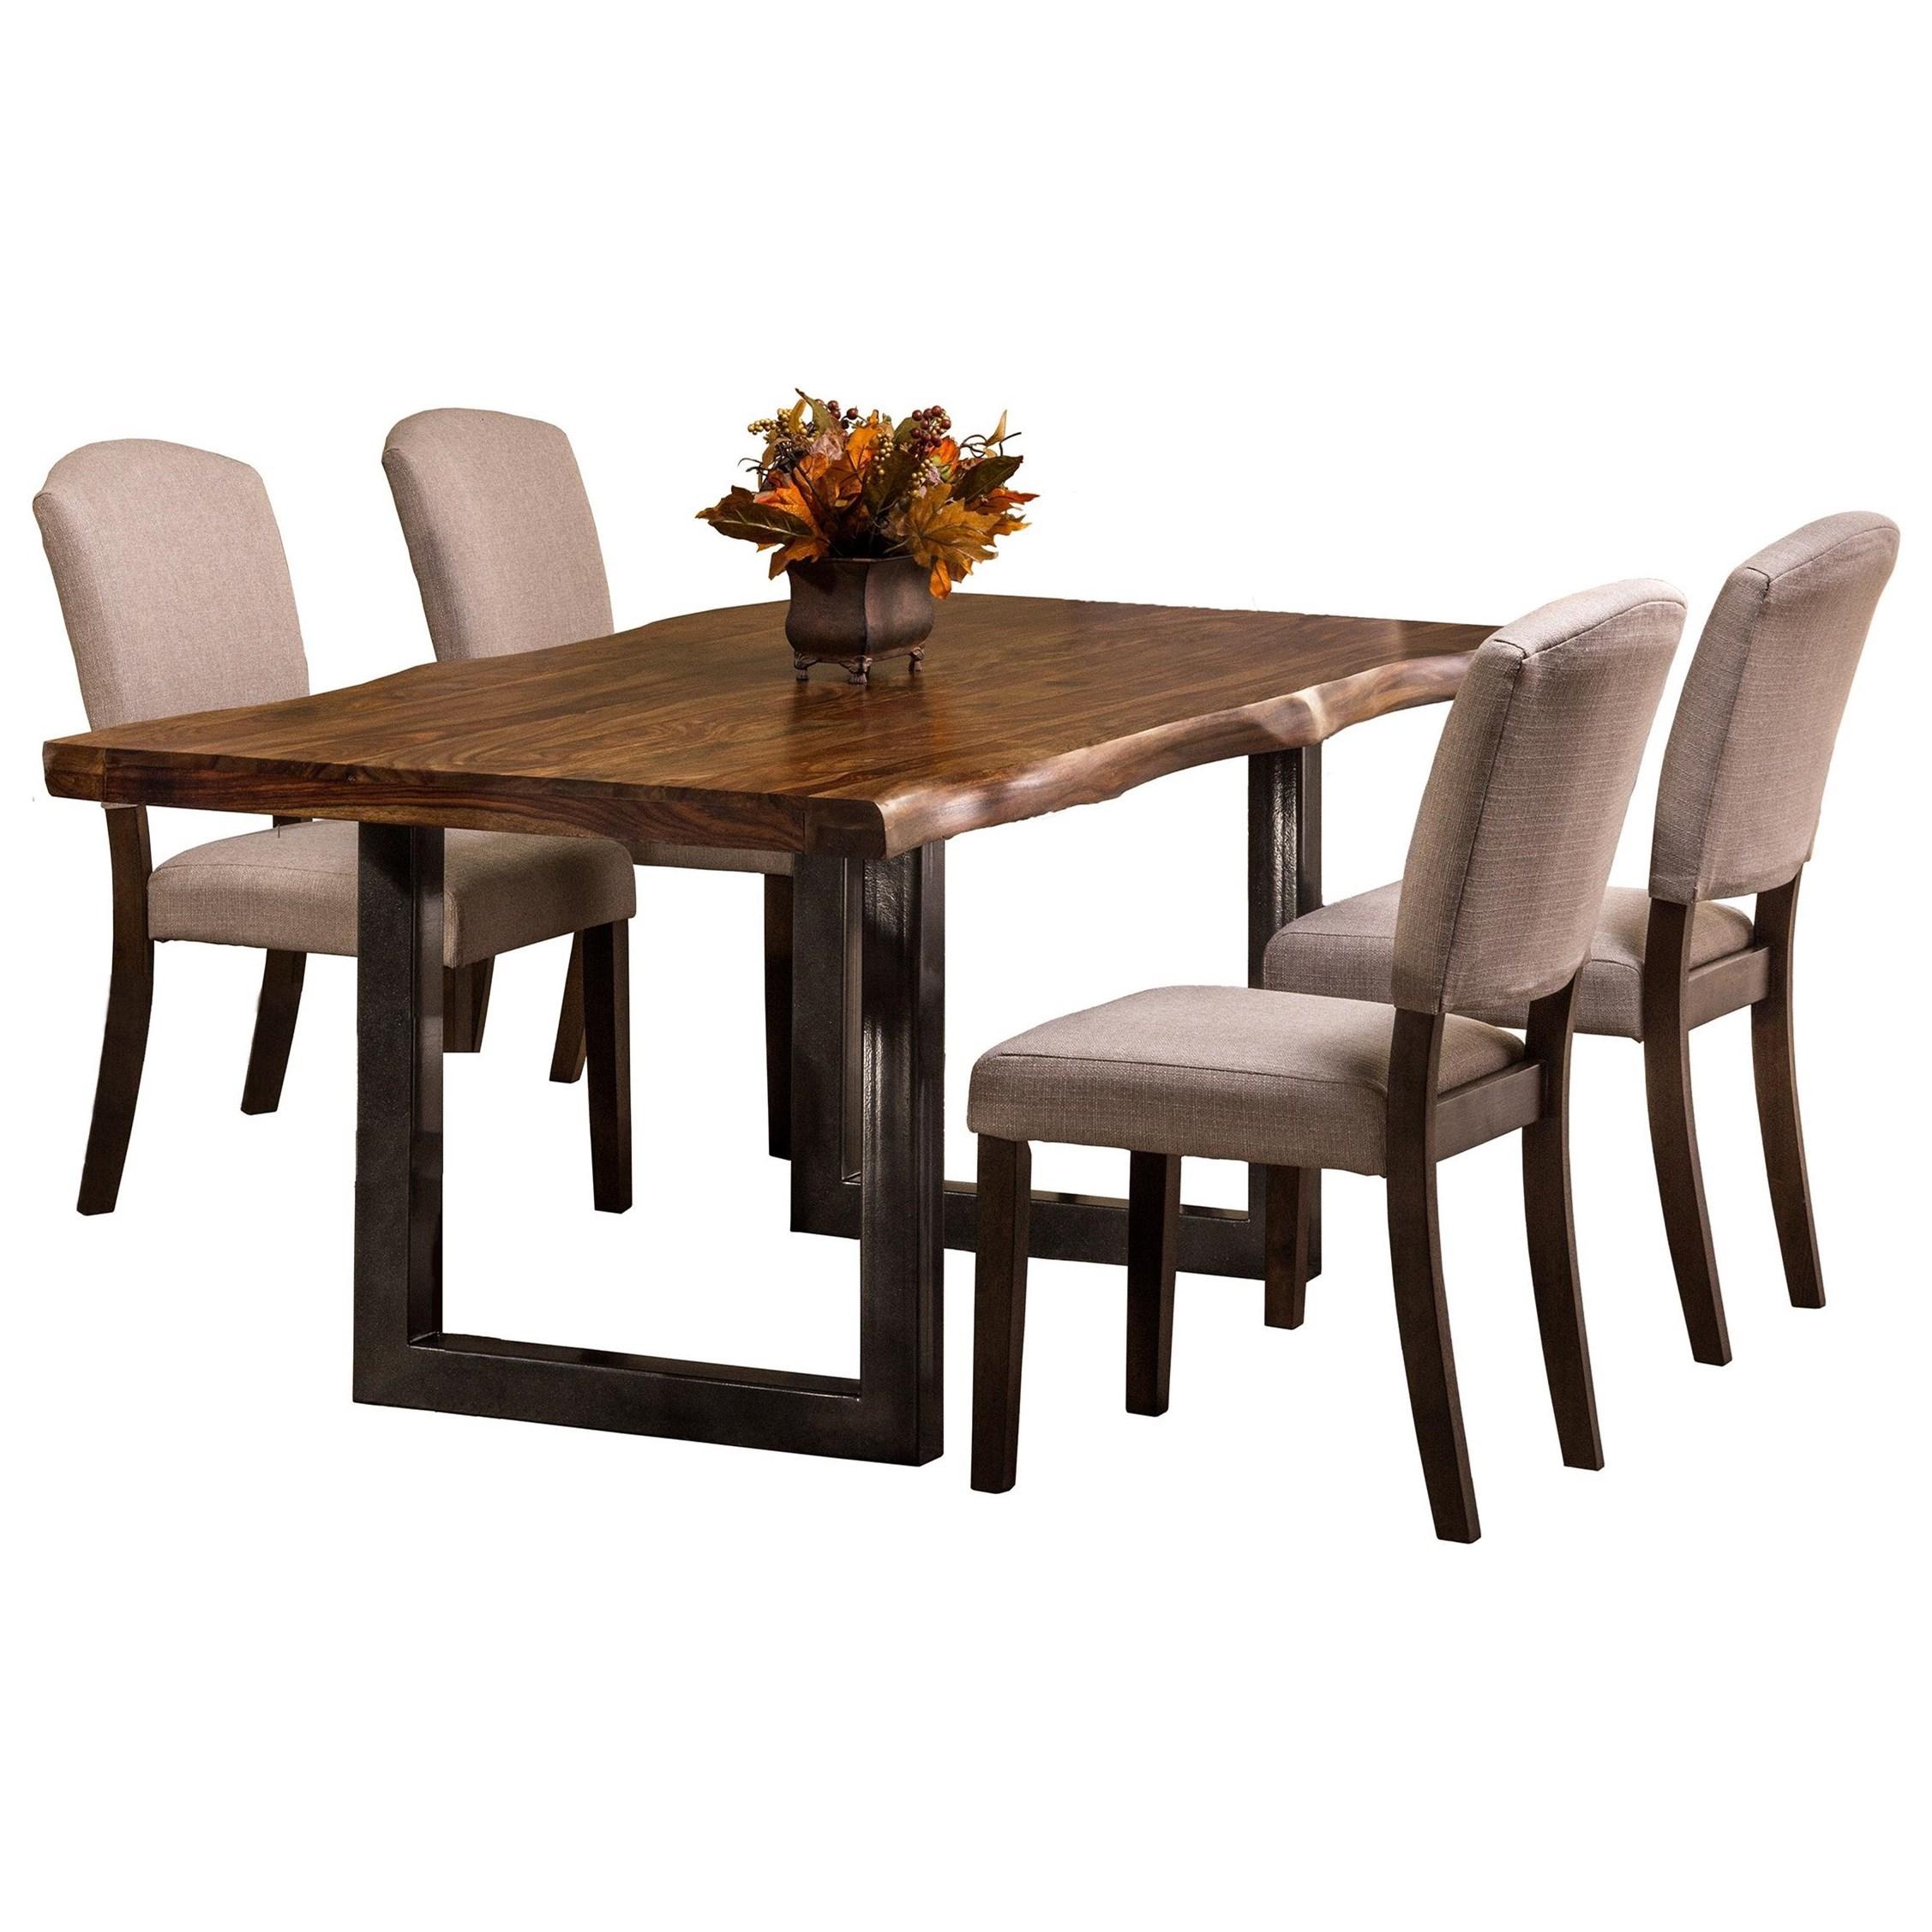 hillsdale emerson natural sheesham wood rectangular dining table olinde 39 s furniture dining. Black Bedroom Furniture Sets. Home Design Ideas